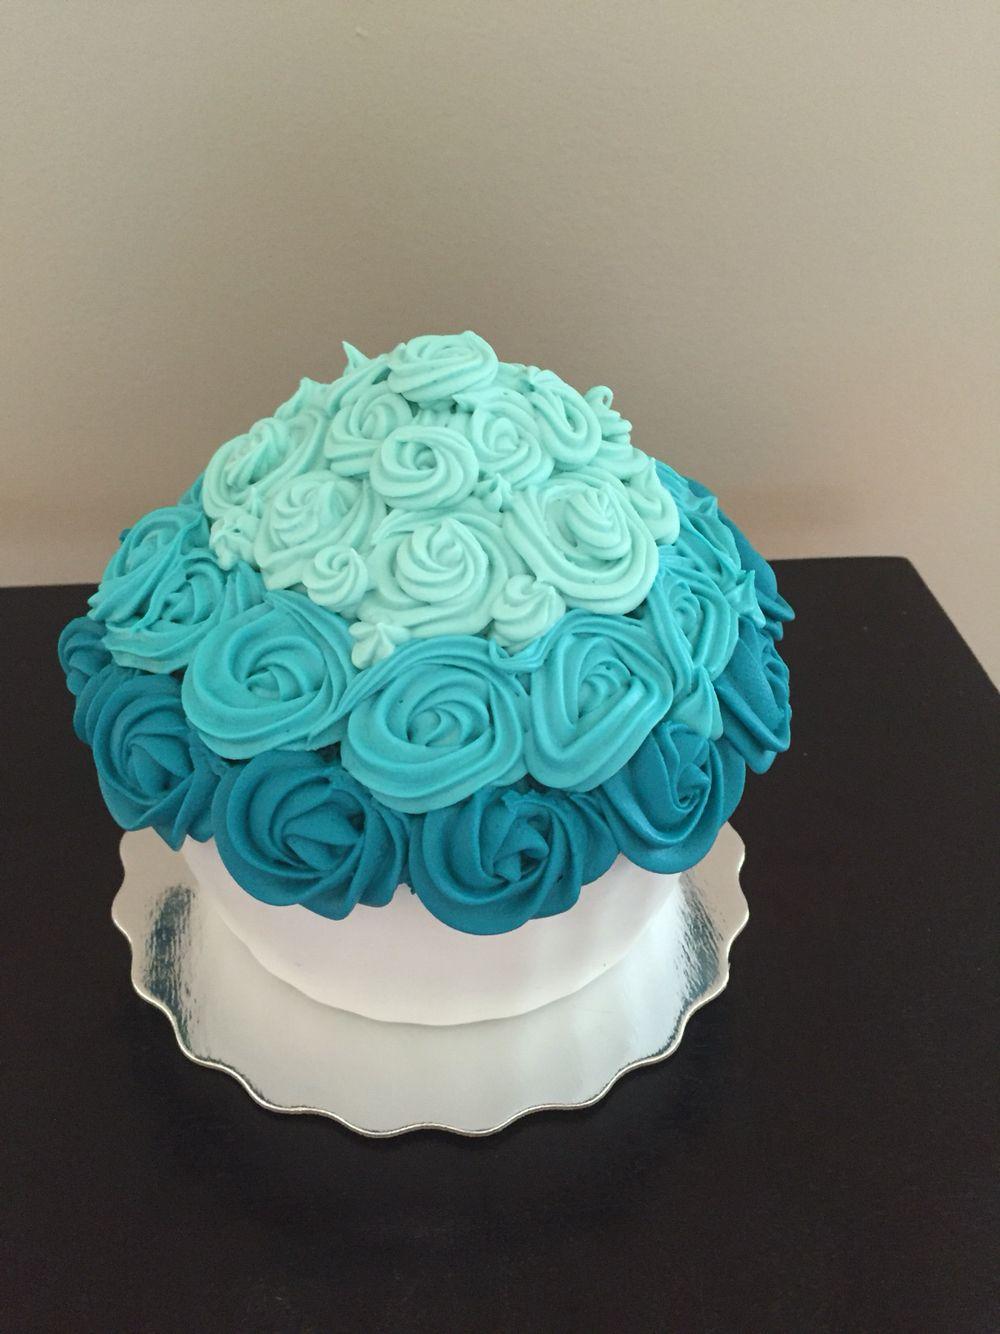 Cake ideas on pinterest pirate cakes marshmallow fondant and - Smash Cake Giant Cupcake Teal Ombre Icing Vanilla Cake With A Marshmallow Fondant